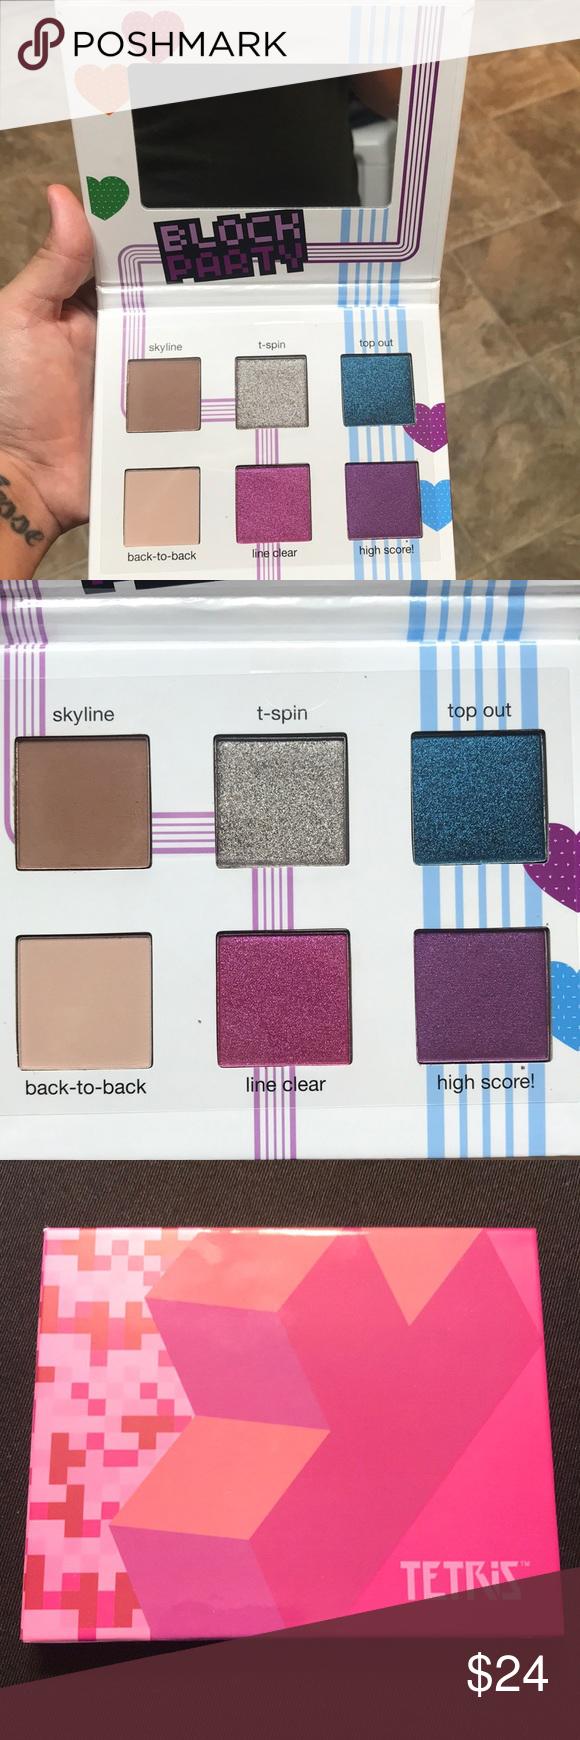 e4da7a1dcf42 TETRIS x Ipsy block party makeup palette NEW Beautiful palette just ...